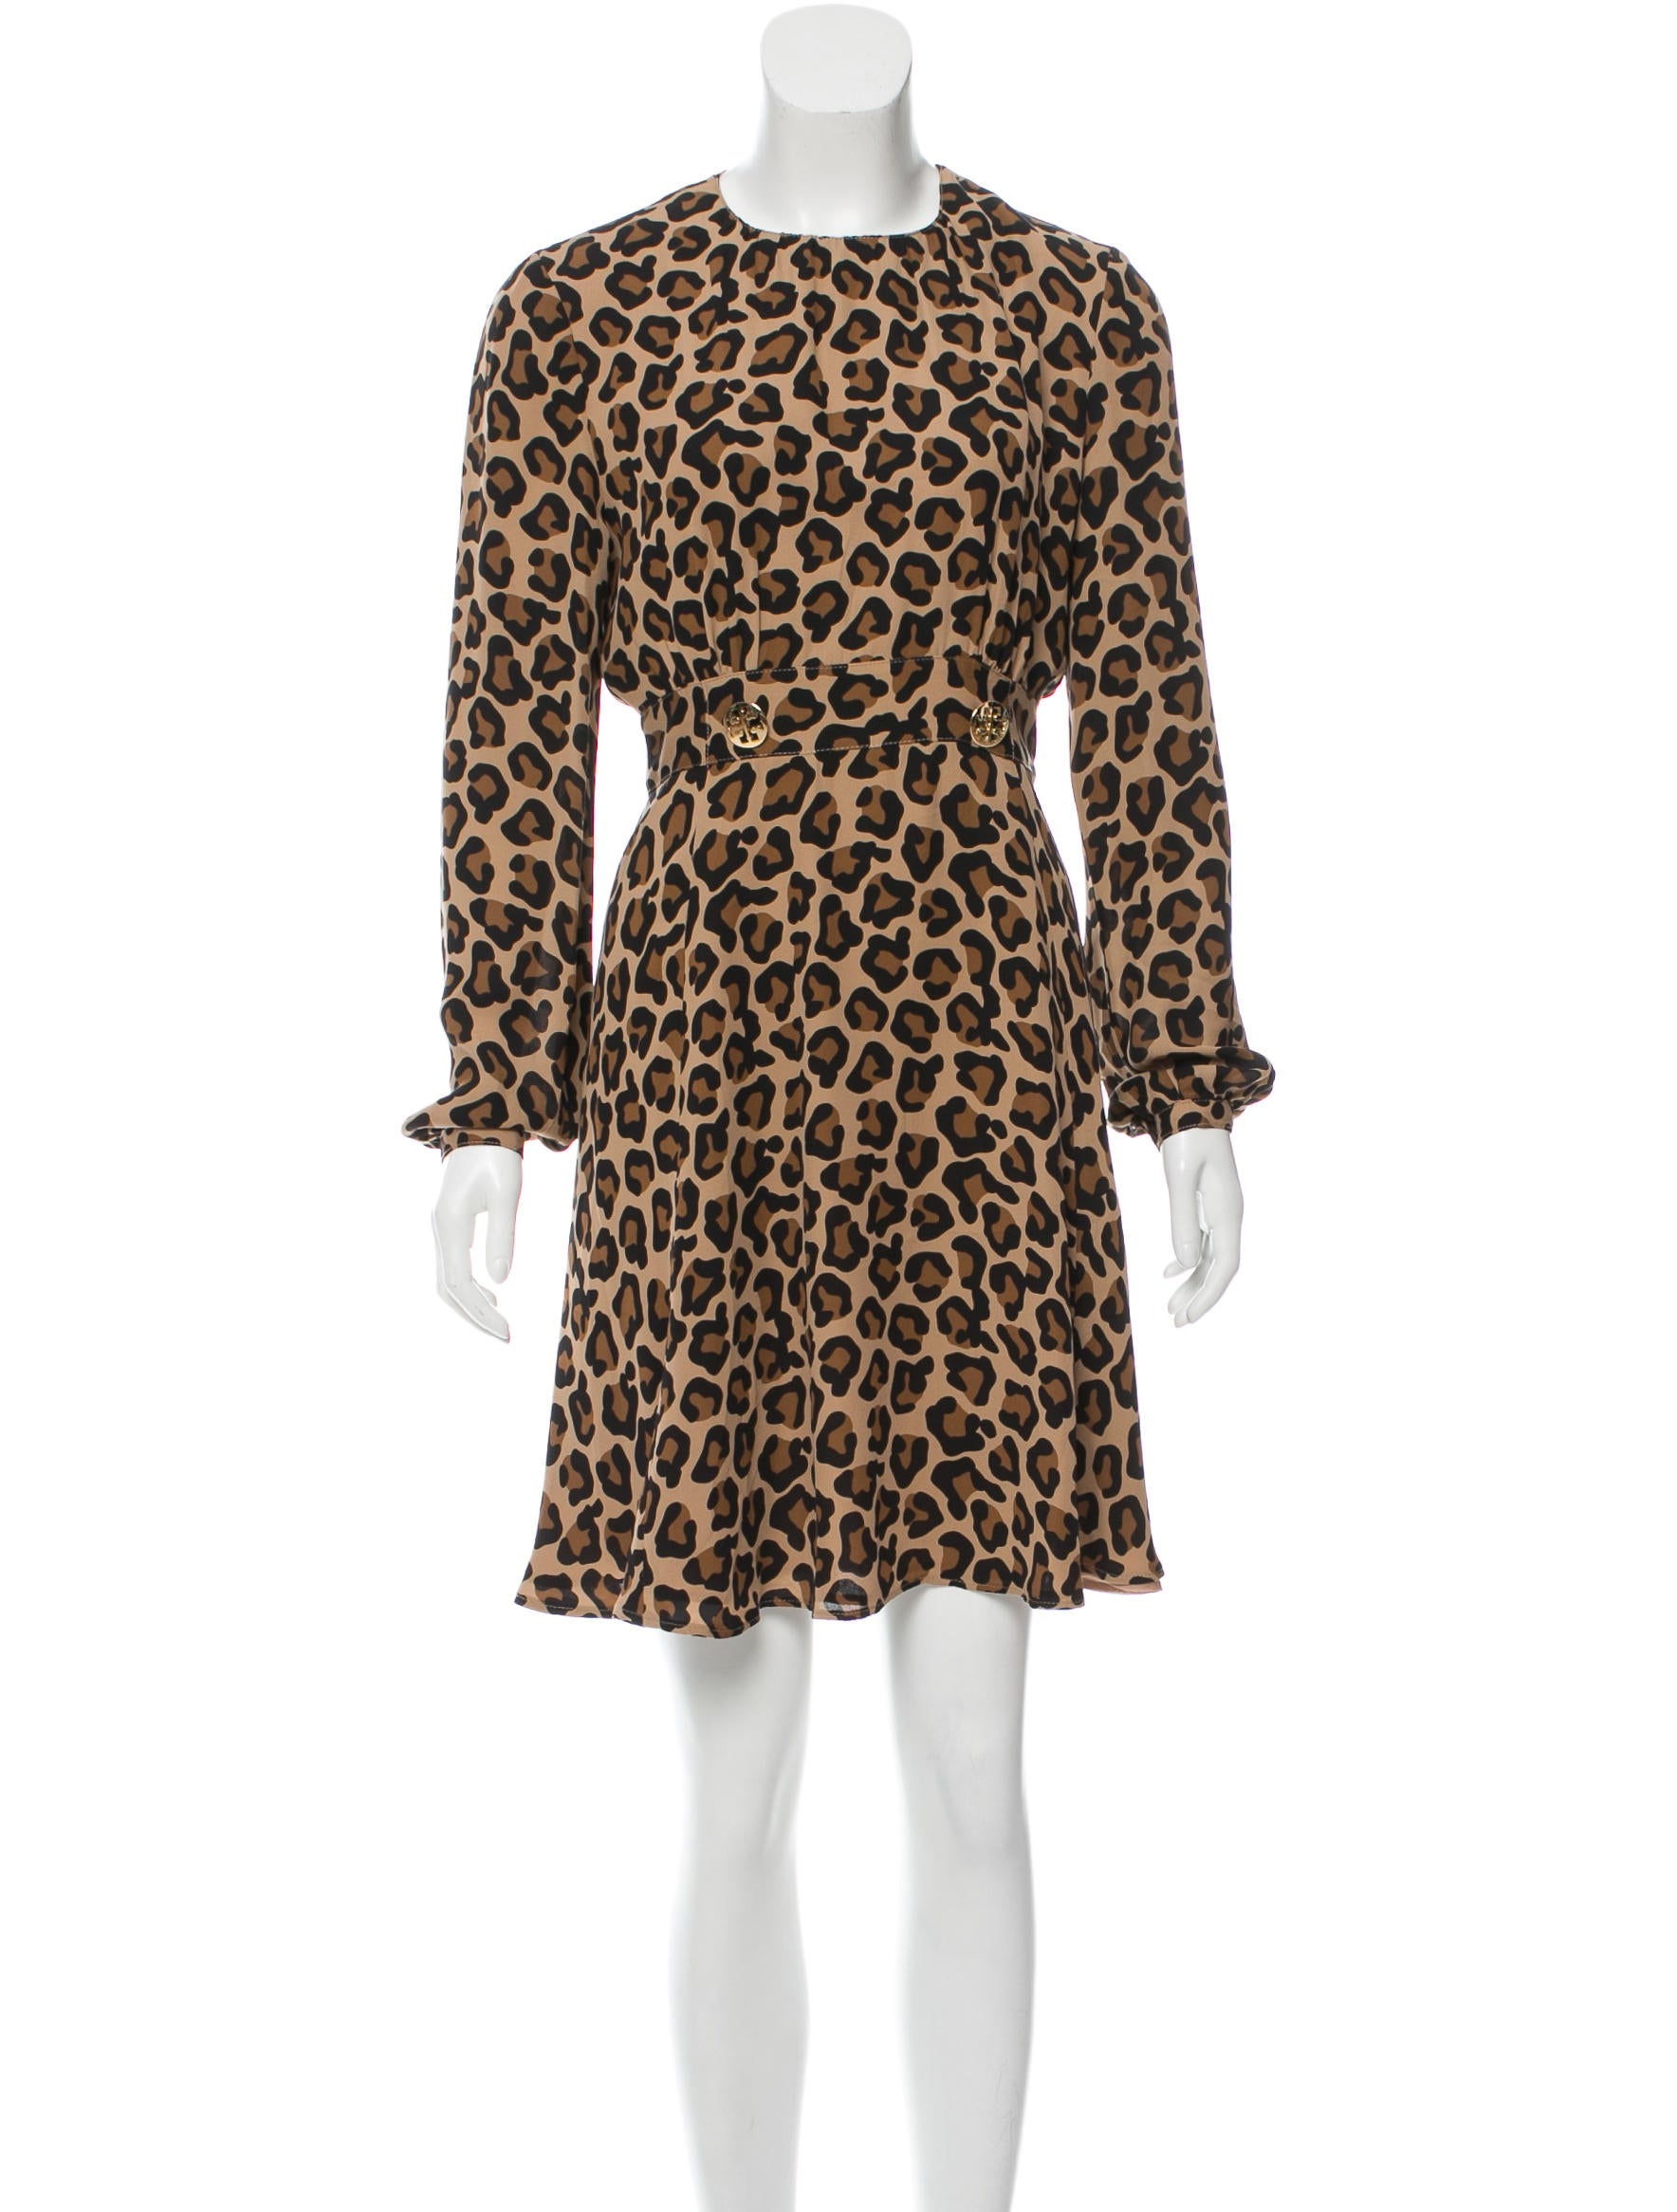 Tory Burch Leopard Printed Silk Dress Clothing